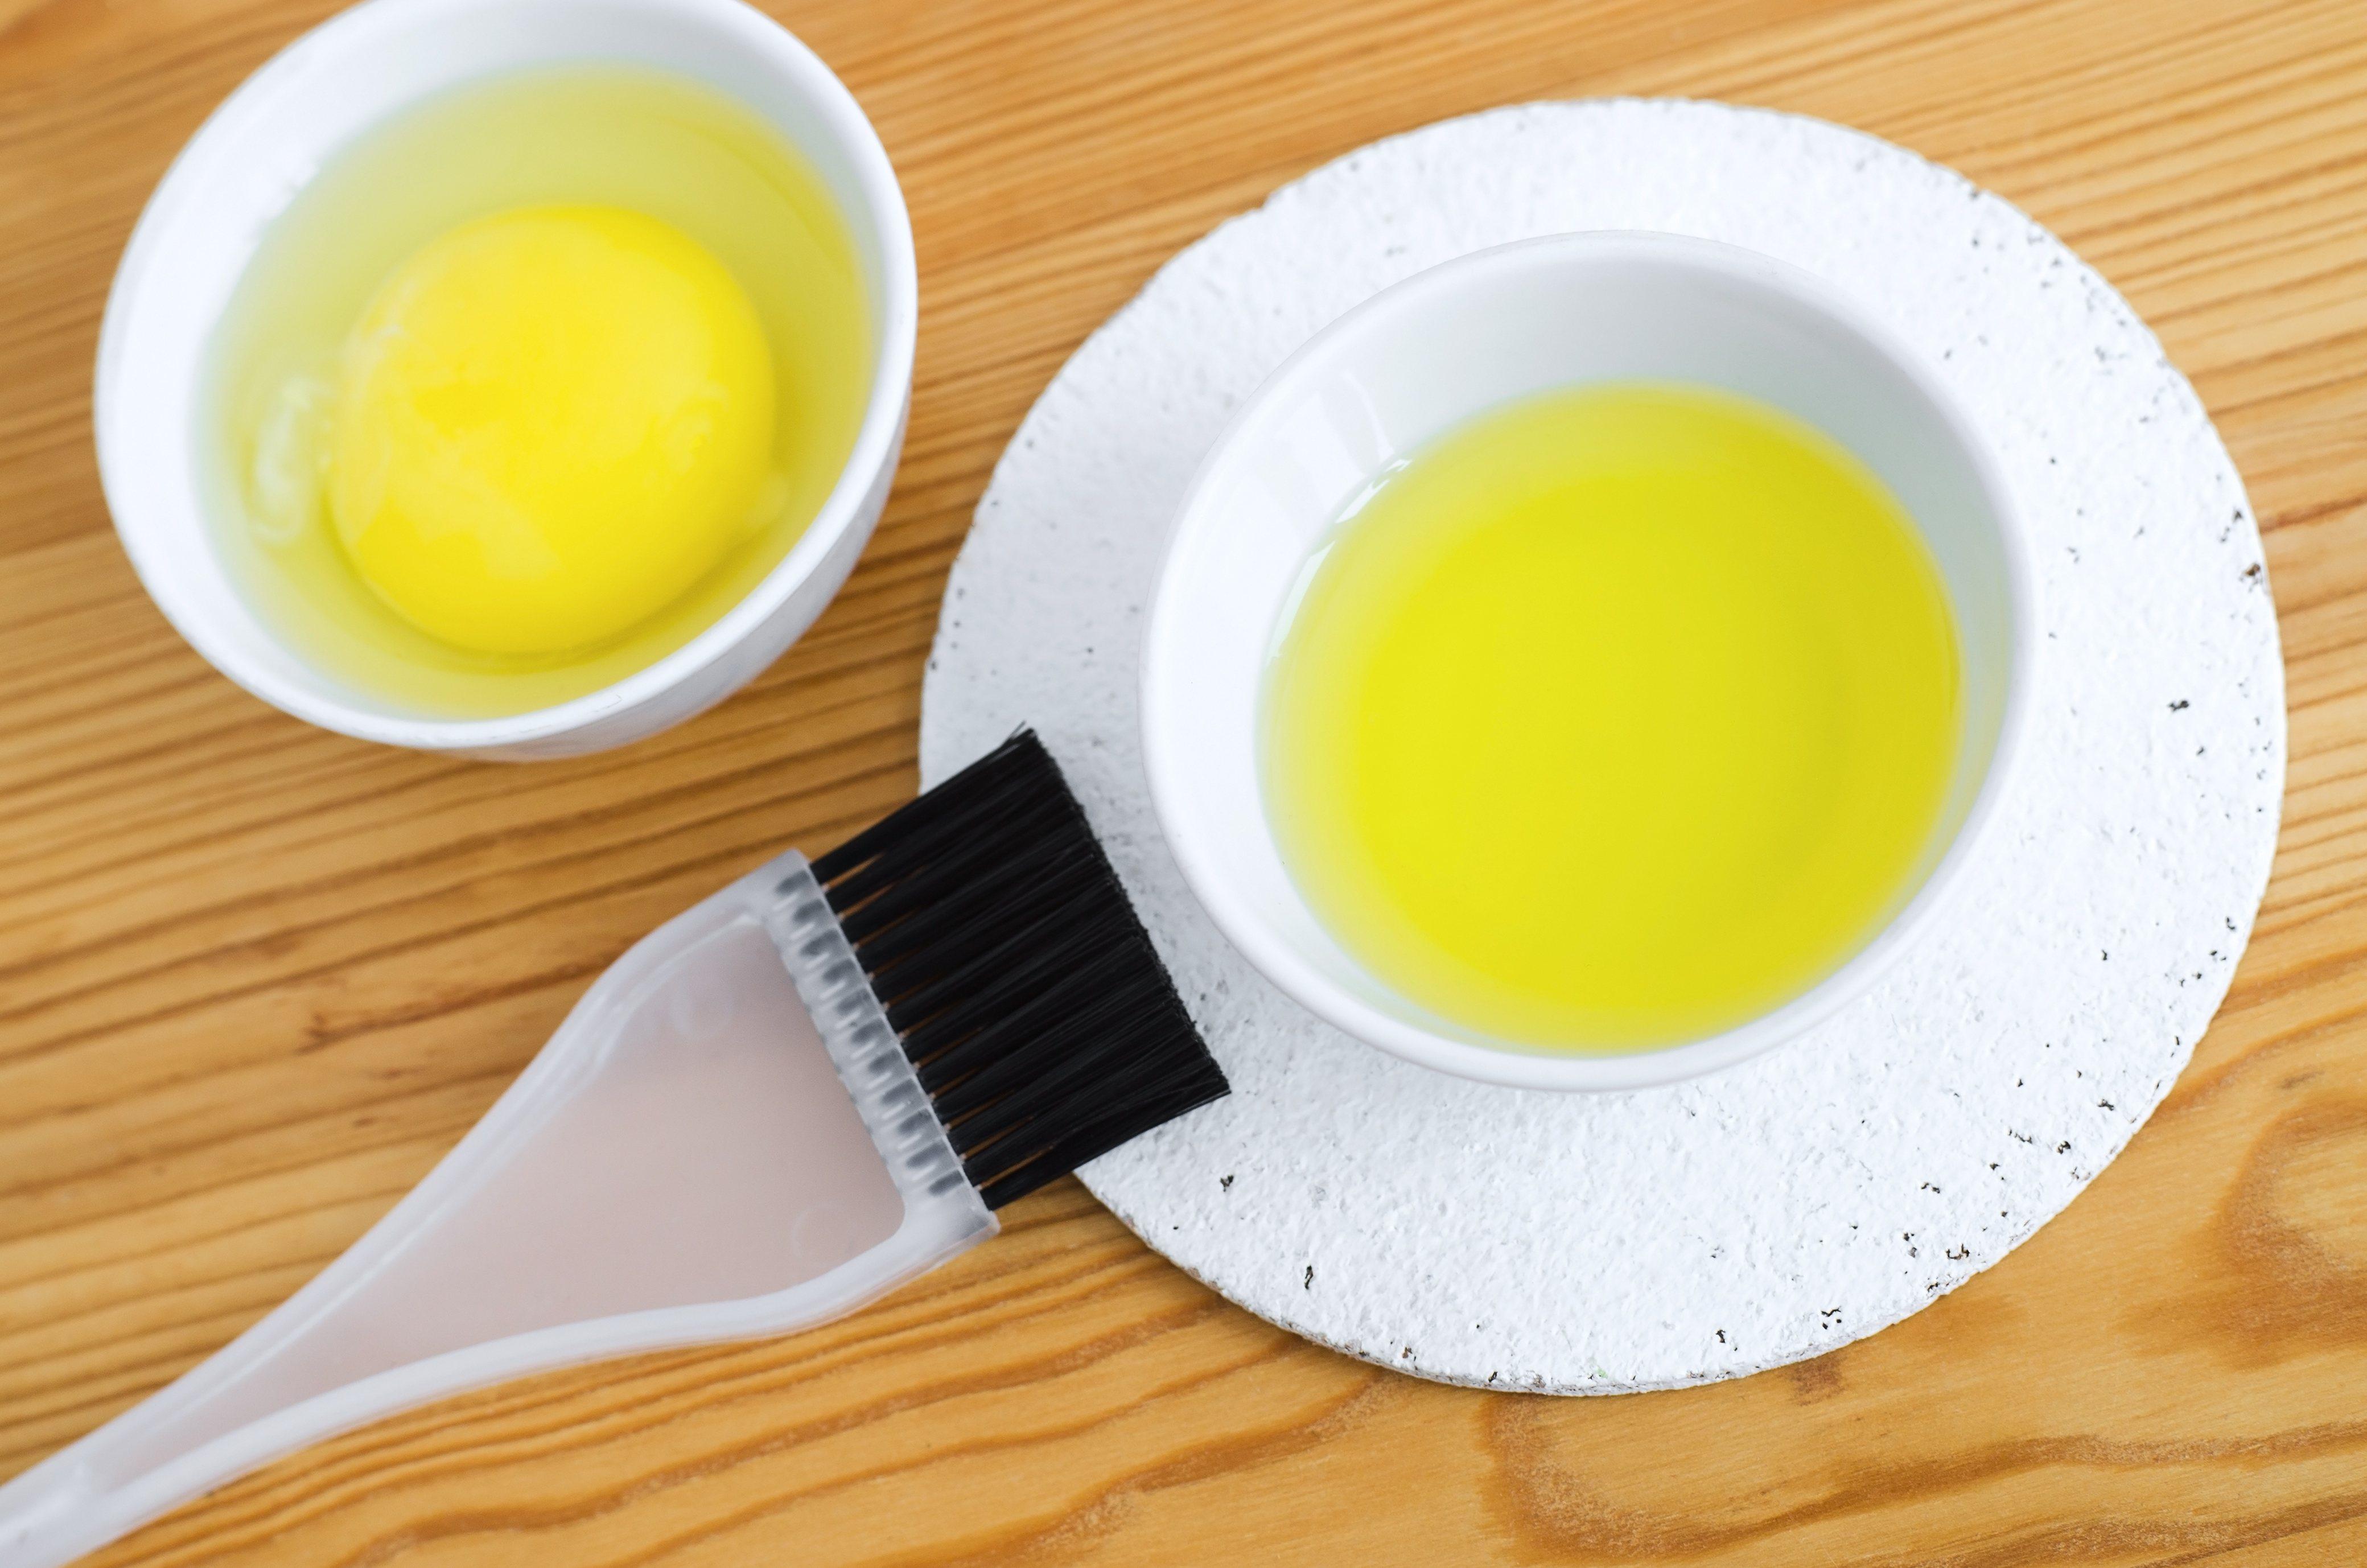 Aplica una mascarilla de bicarbonato de sodio sobre tu rostro